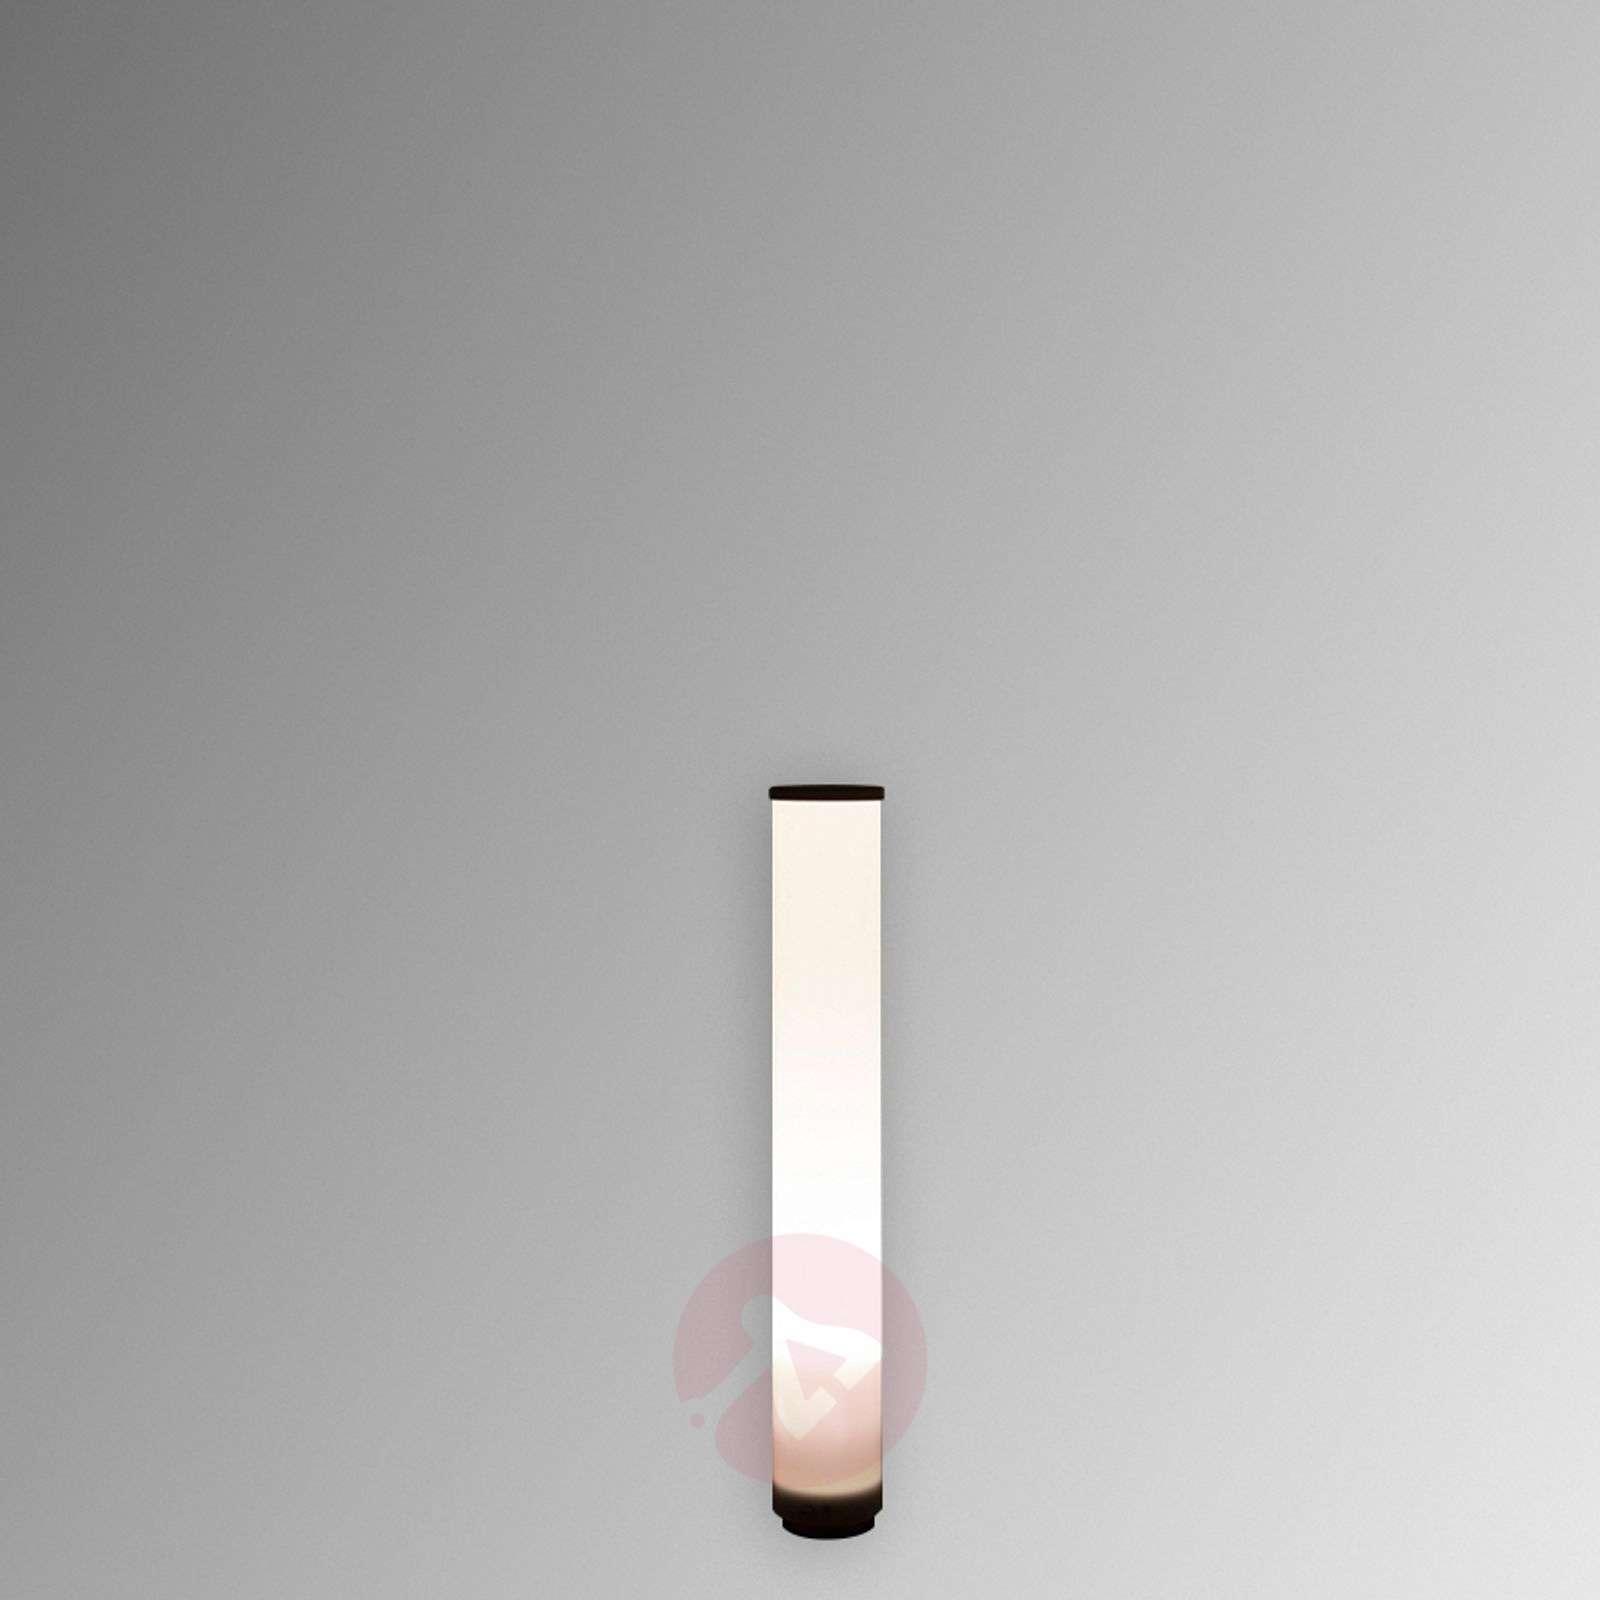 Fabulous Stick Illuminated Column-3050109X-01